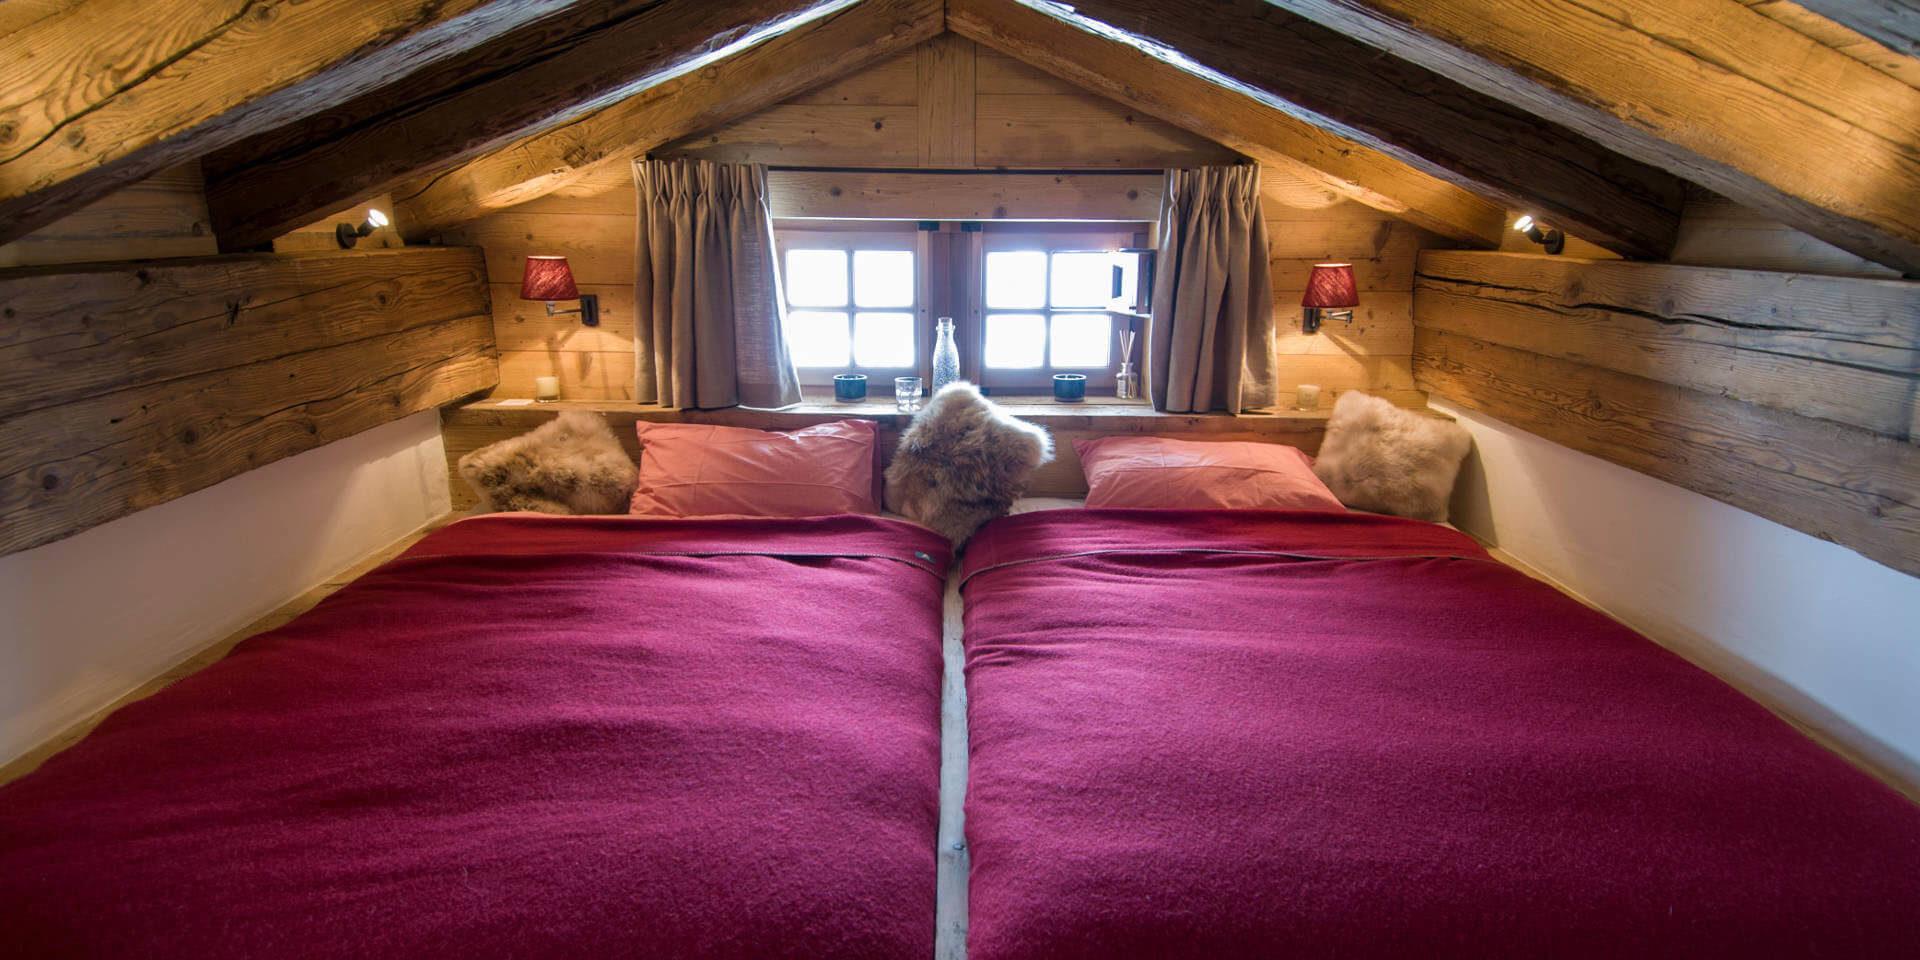 Chalet Nyumba Verbier Les 4 Vallees Zwitserland wintersport skivakantie luxe slaapkamer aparte bedden houten balken onder dak ramen knus